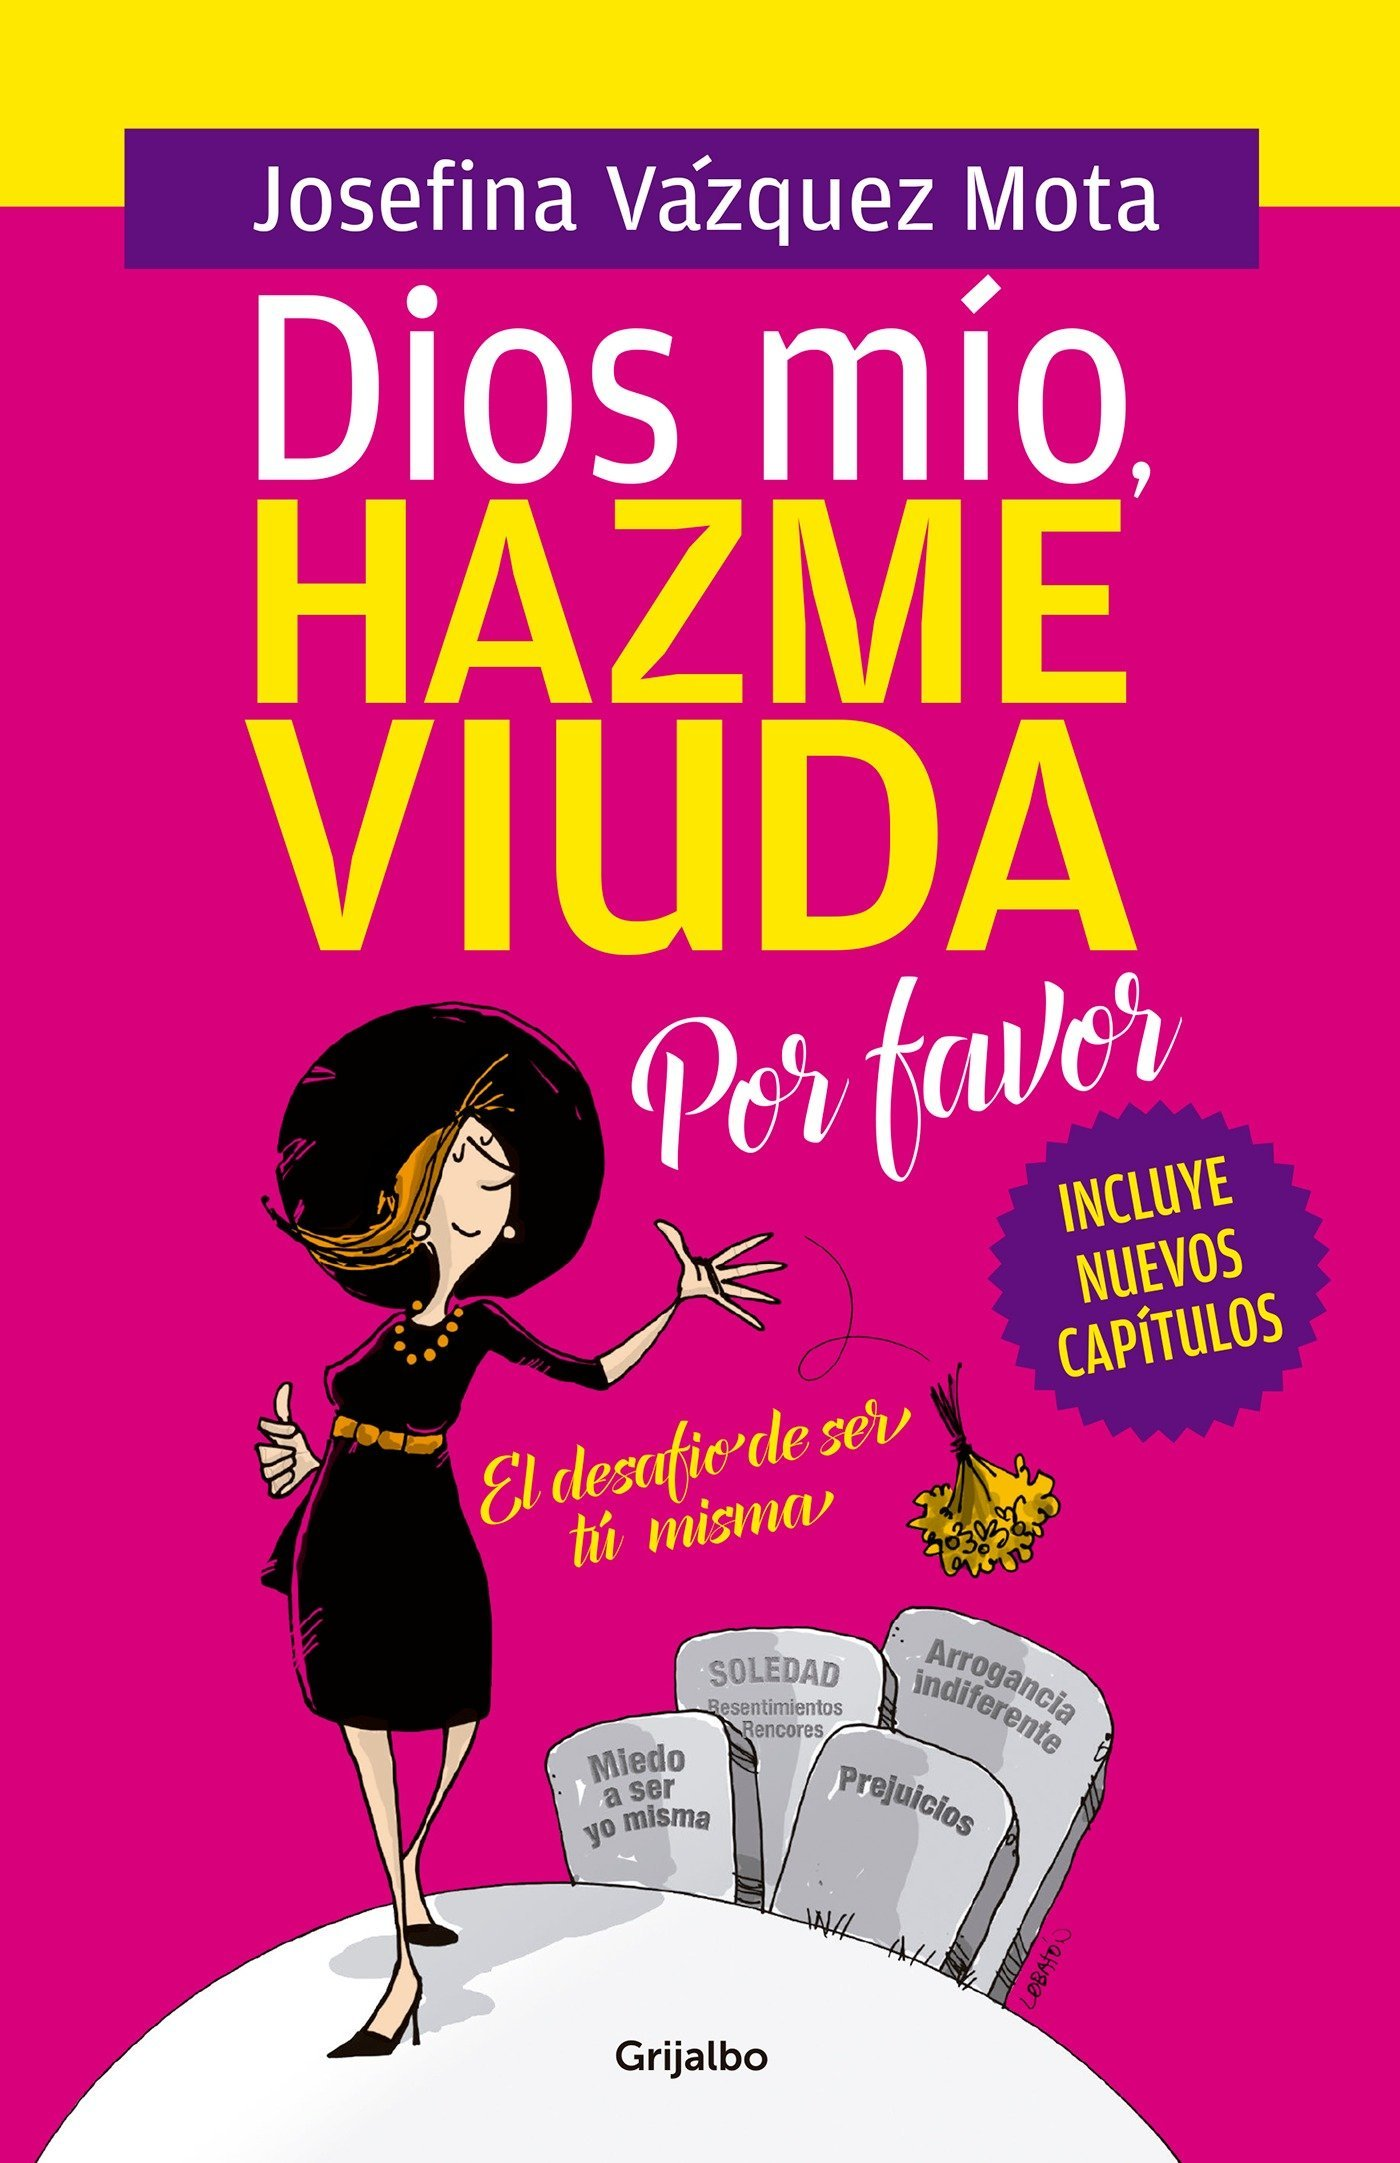 Dios mio hazme viuda por favor / God, Please Make Me a Widow (Spanish Edition)